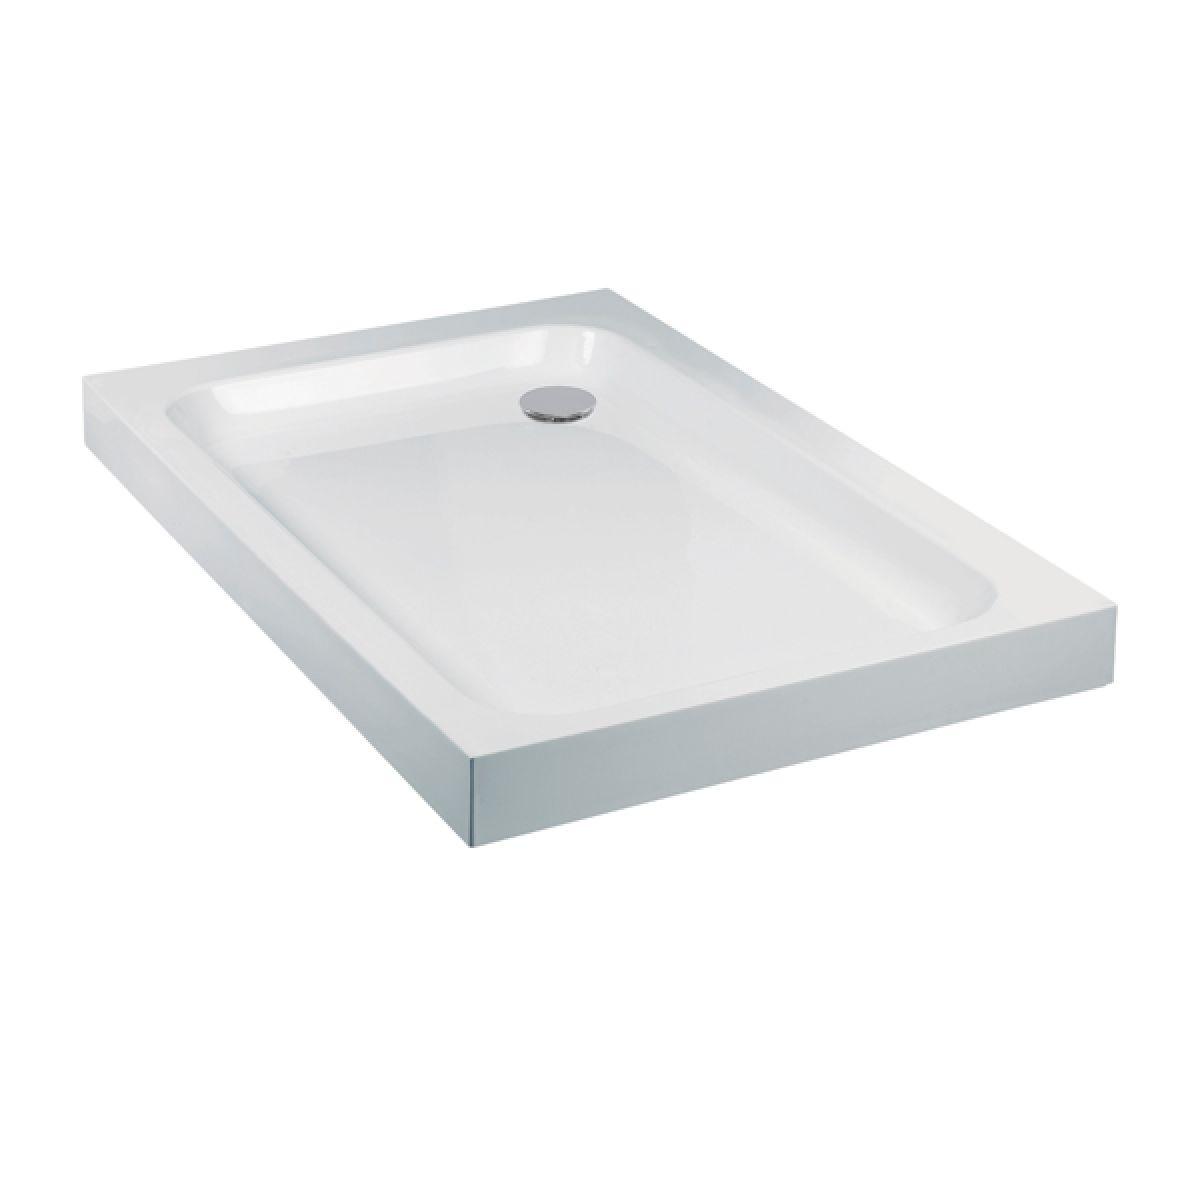 Frontline Standard Rectanglular Shower Tray 1100 x 800mm